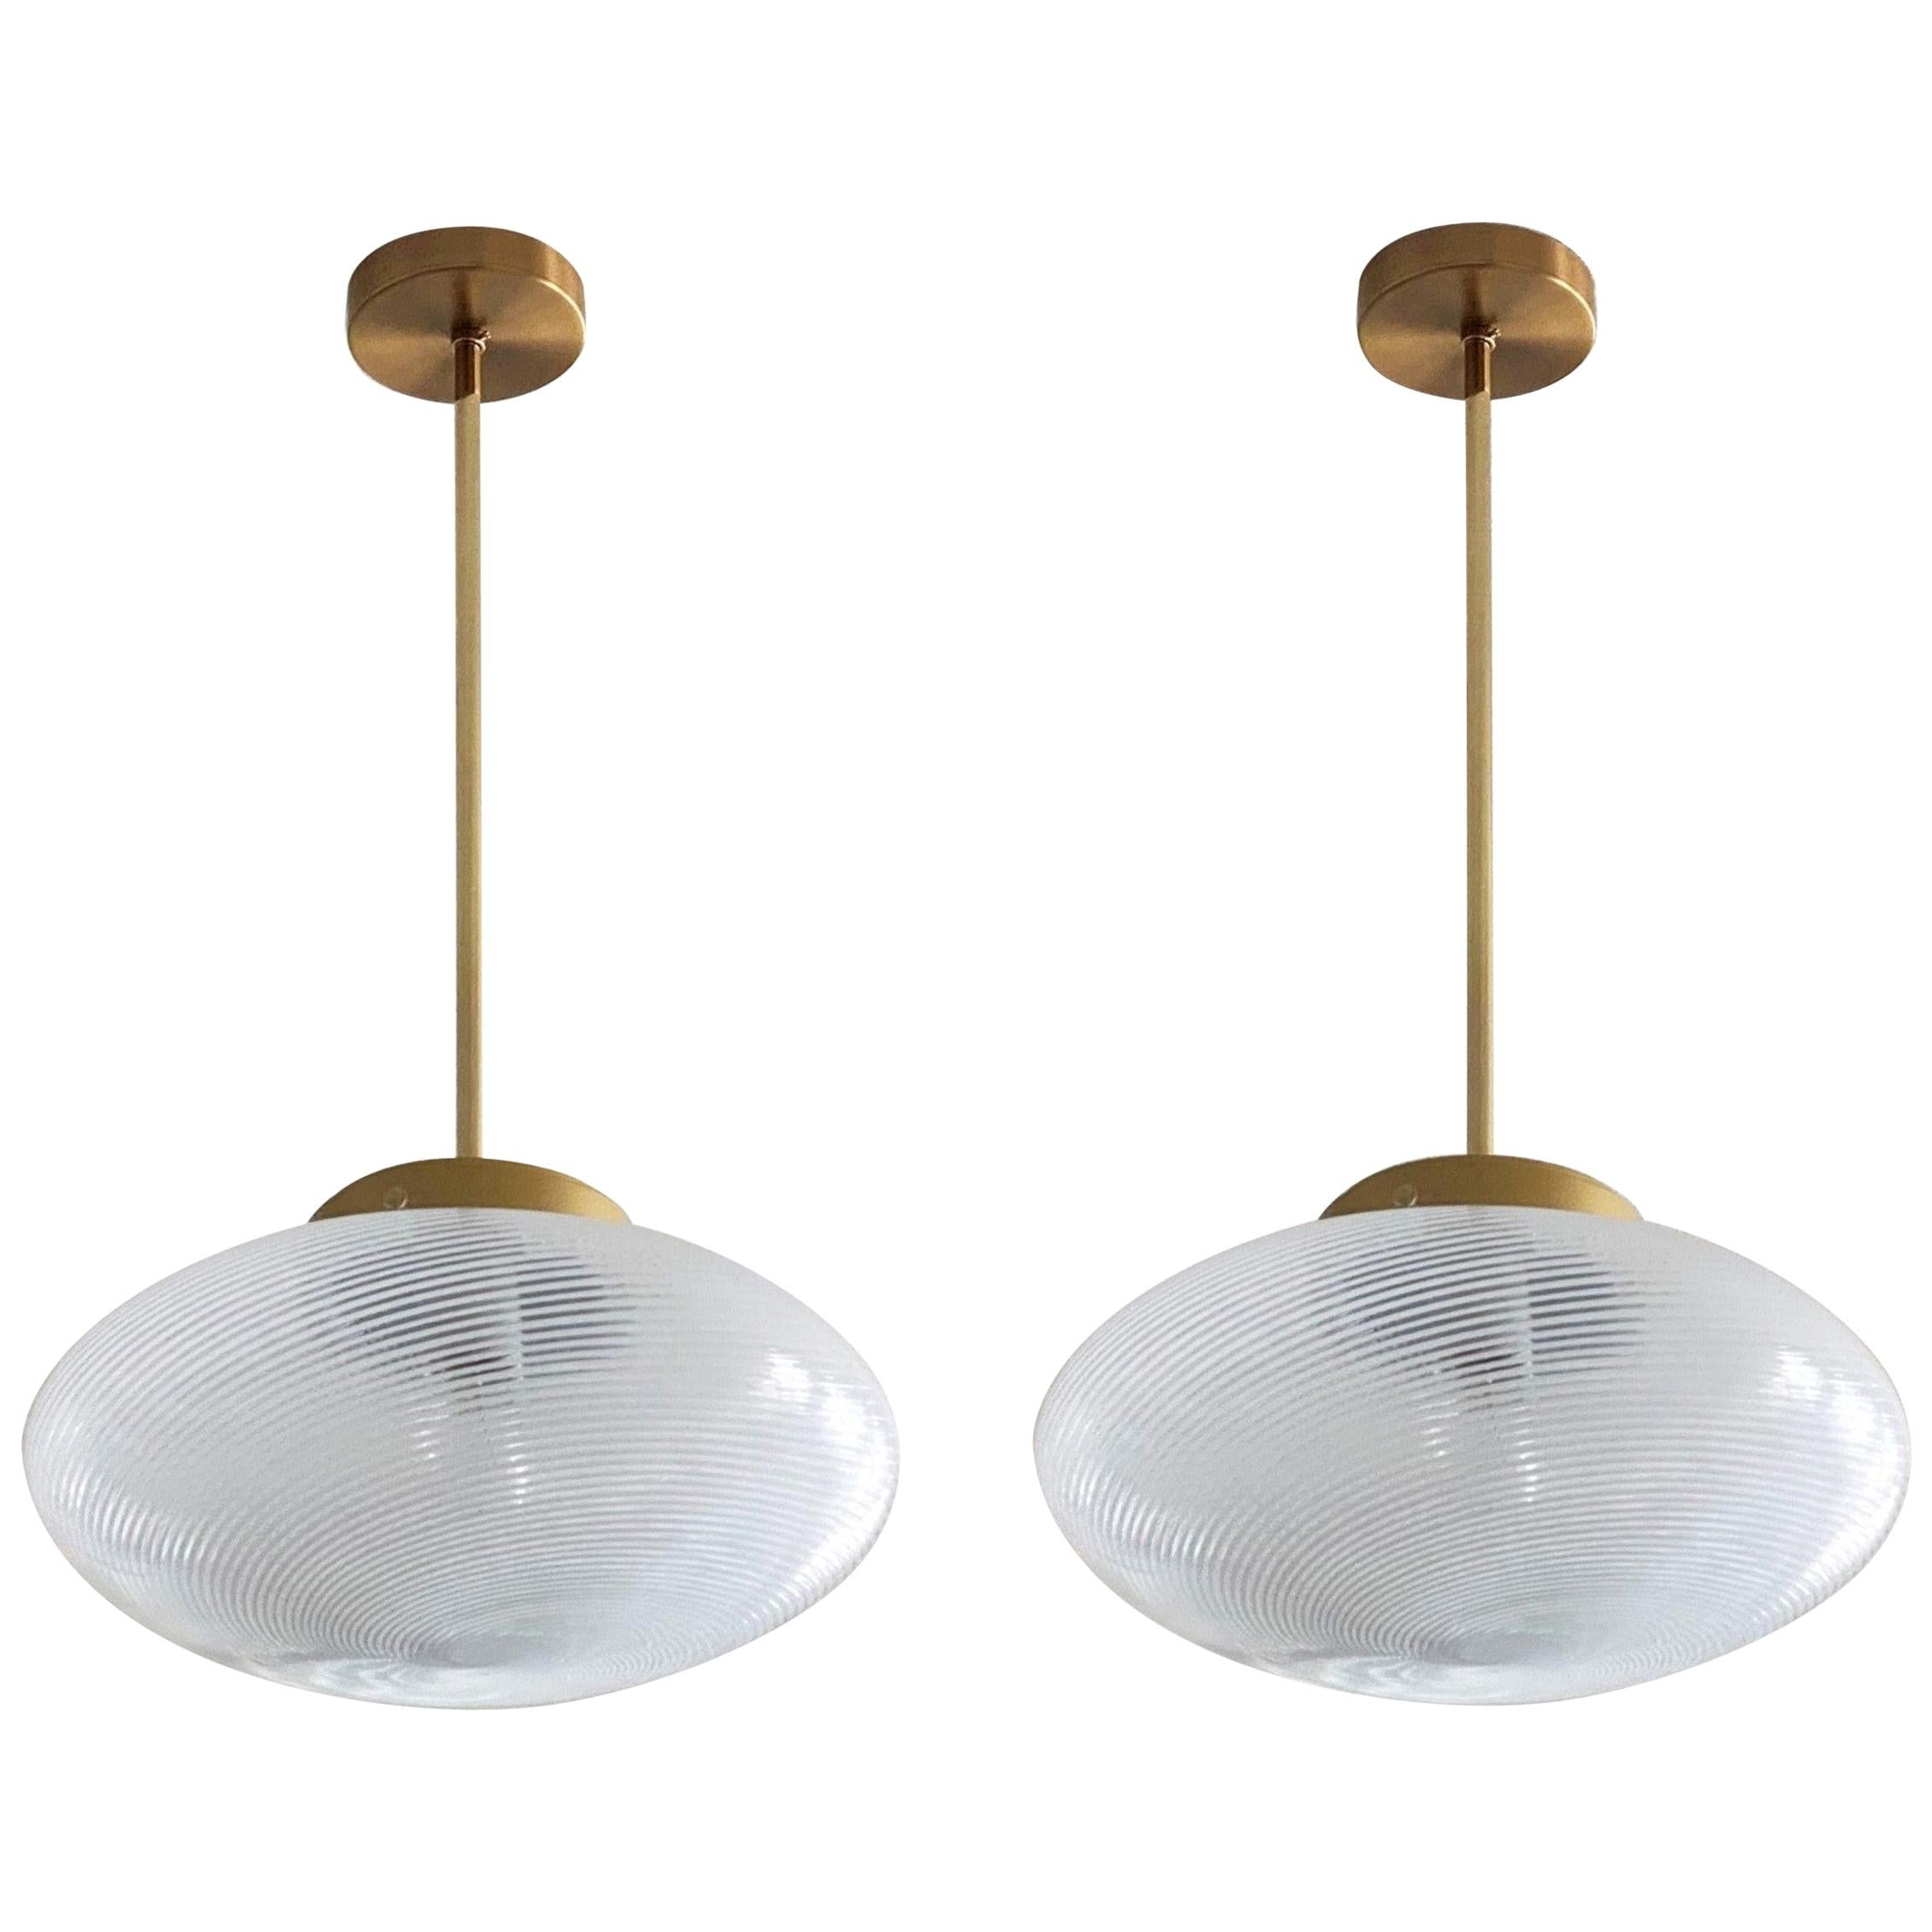 Two Italian Mid-Century Venini Pendants Murano Glass, 1960s